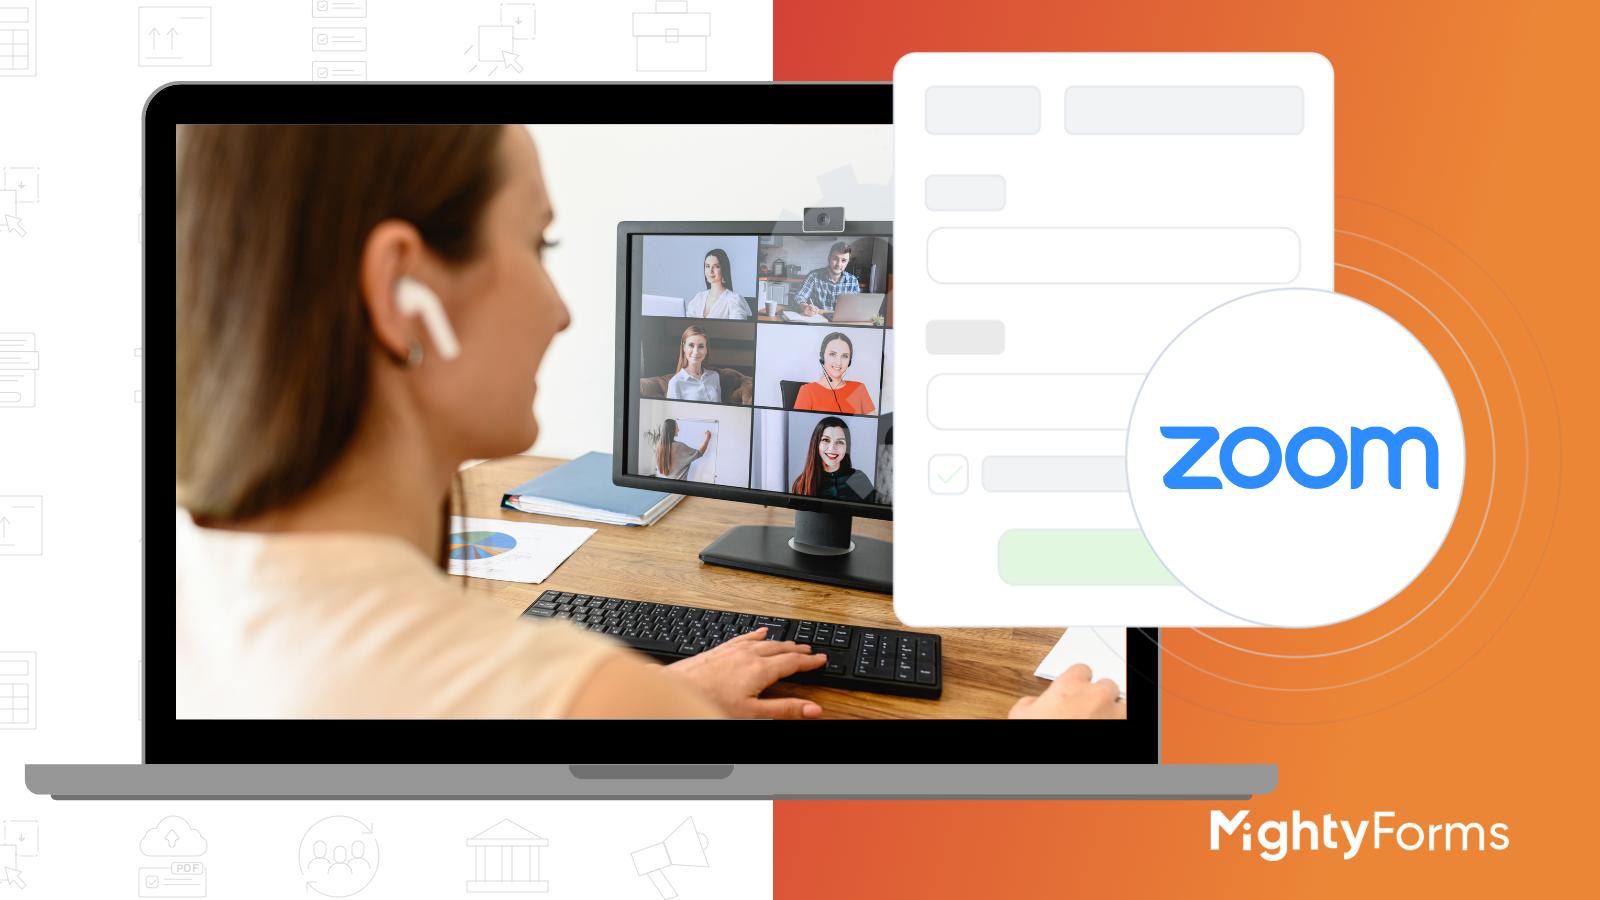 Zoom integration - Mightyforms